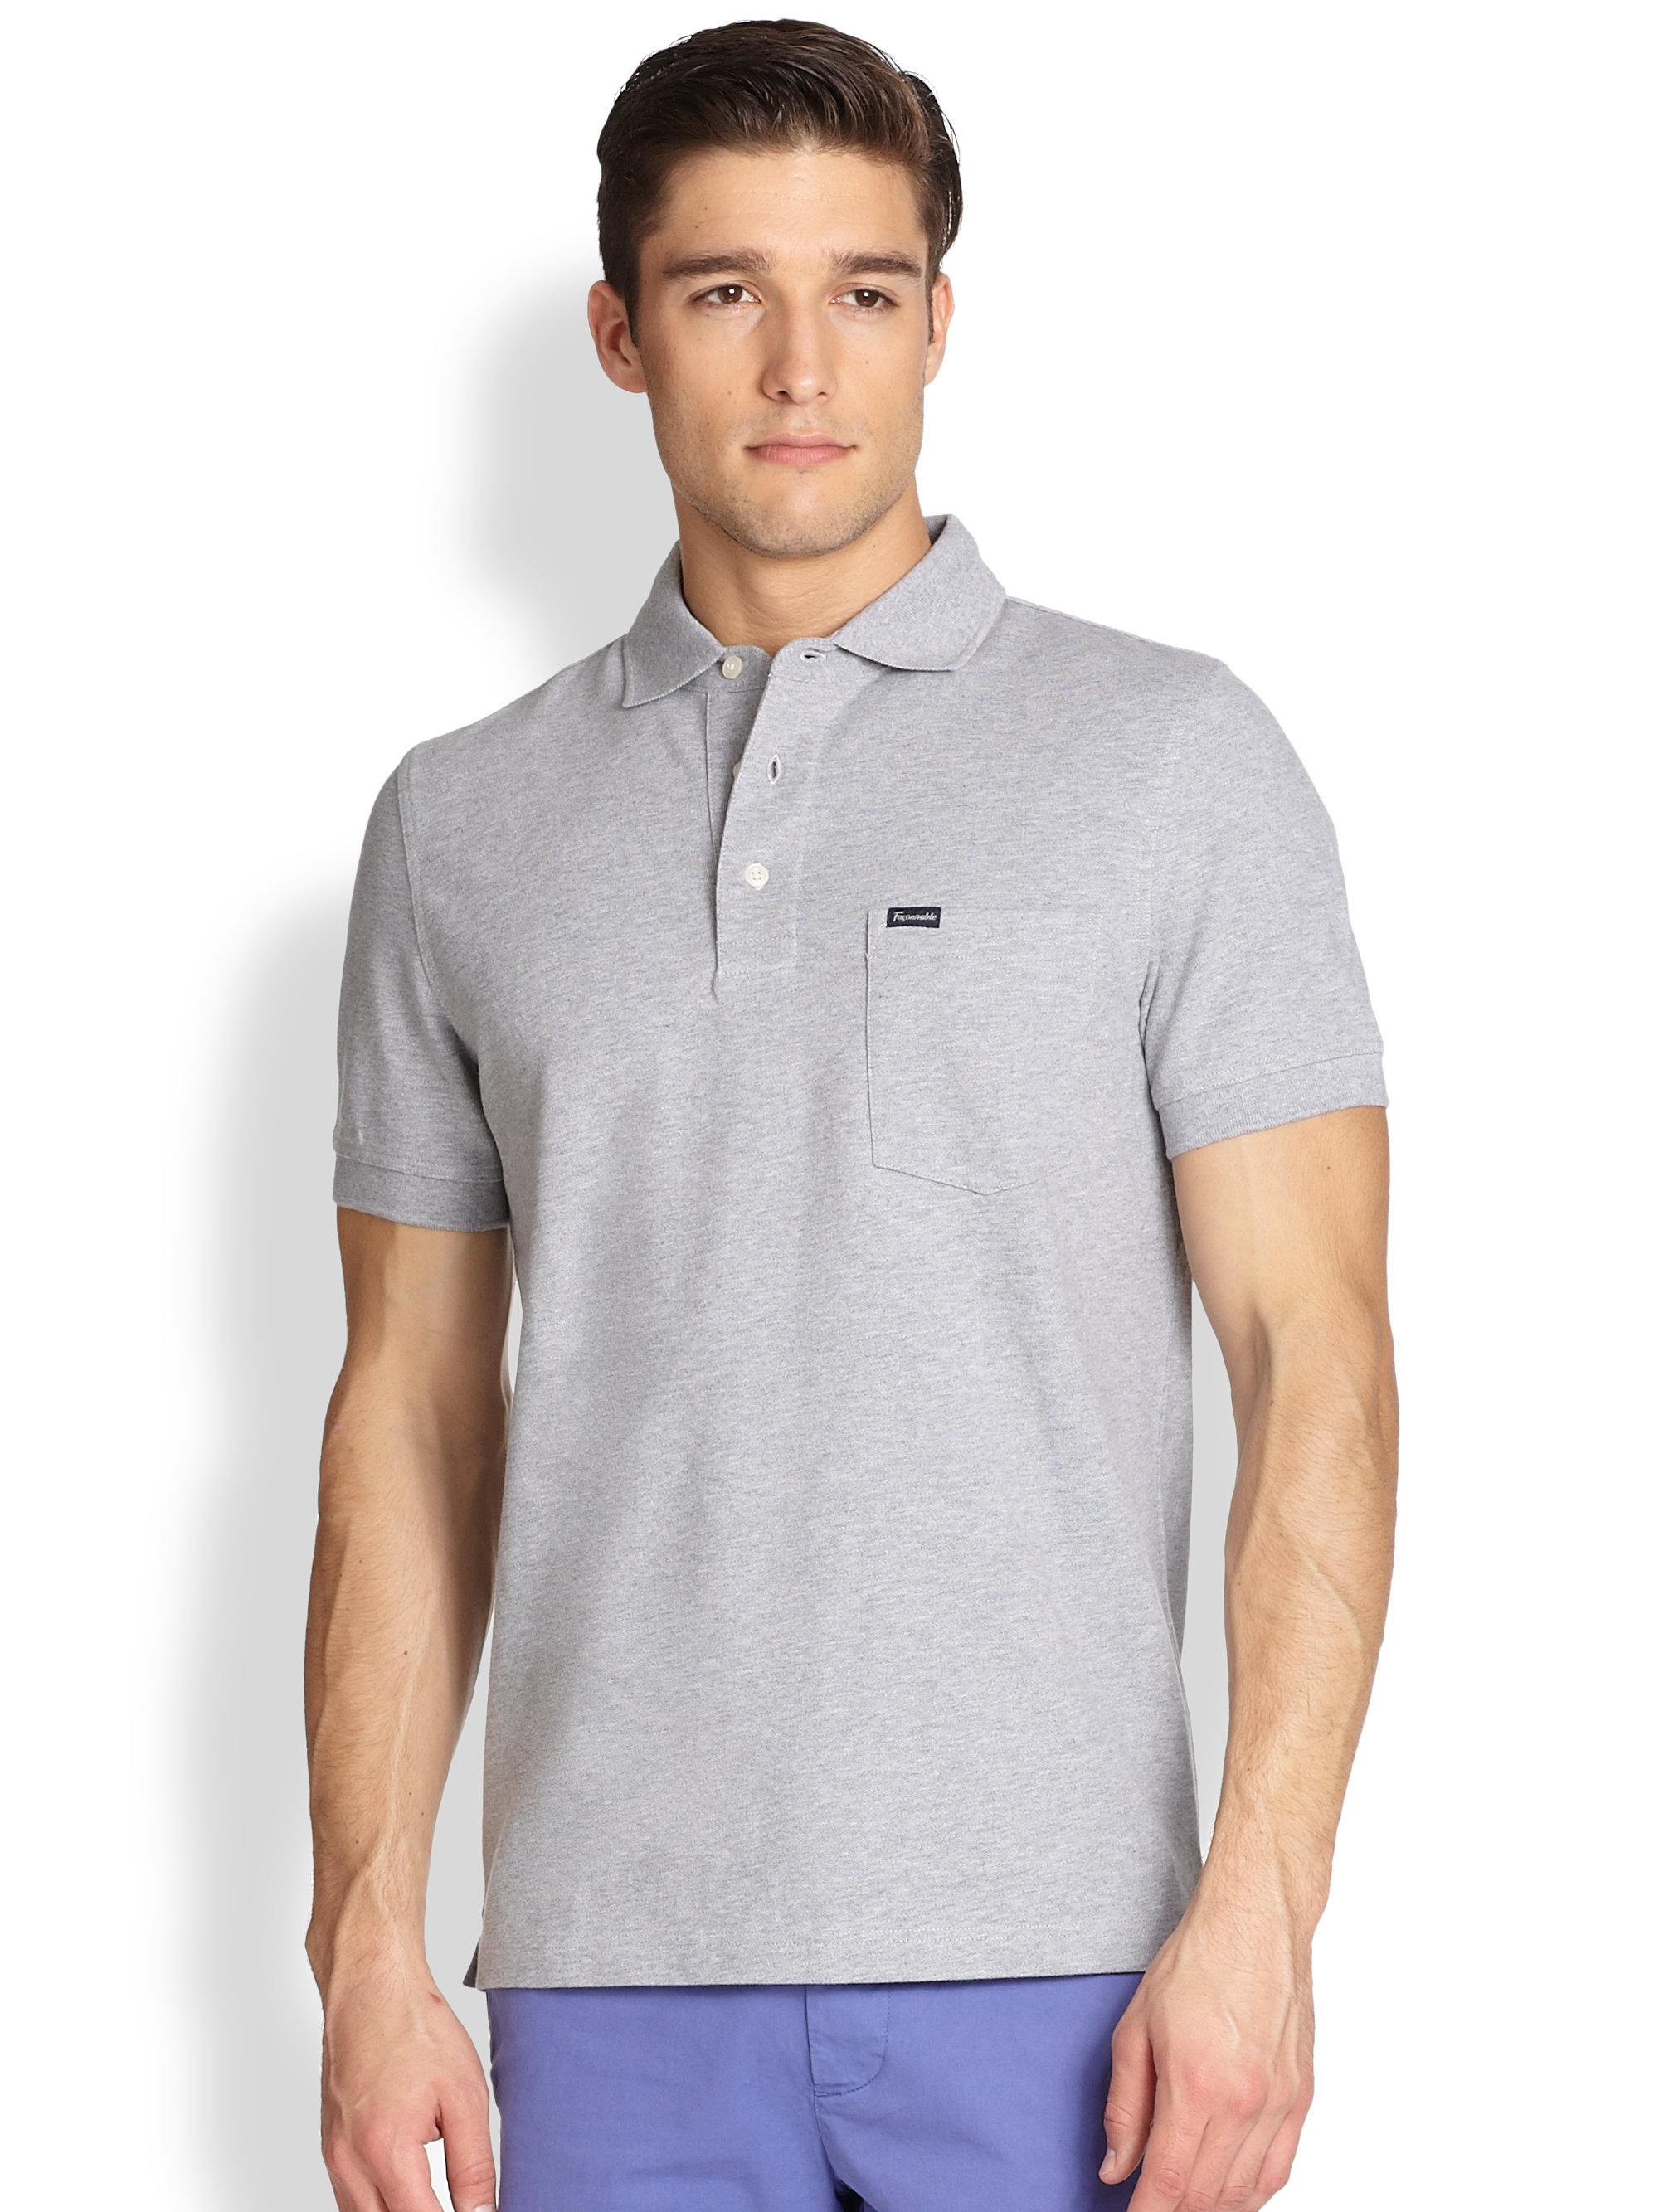 Lyst - Façonnable Pique Polo Shirt in Gray for Men 2148a31b1e40